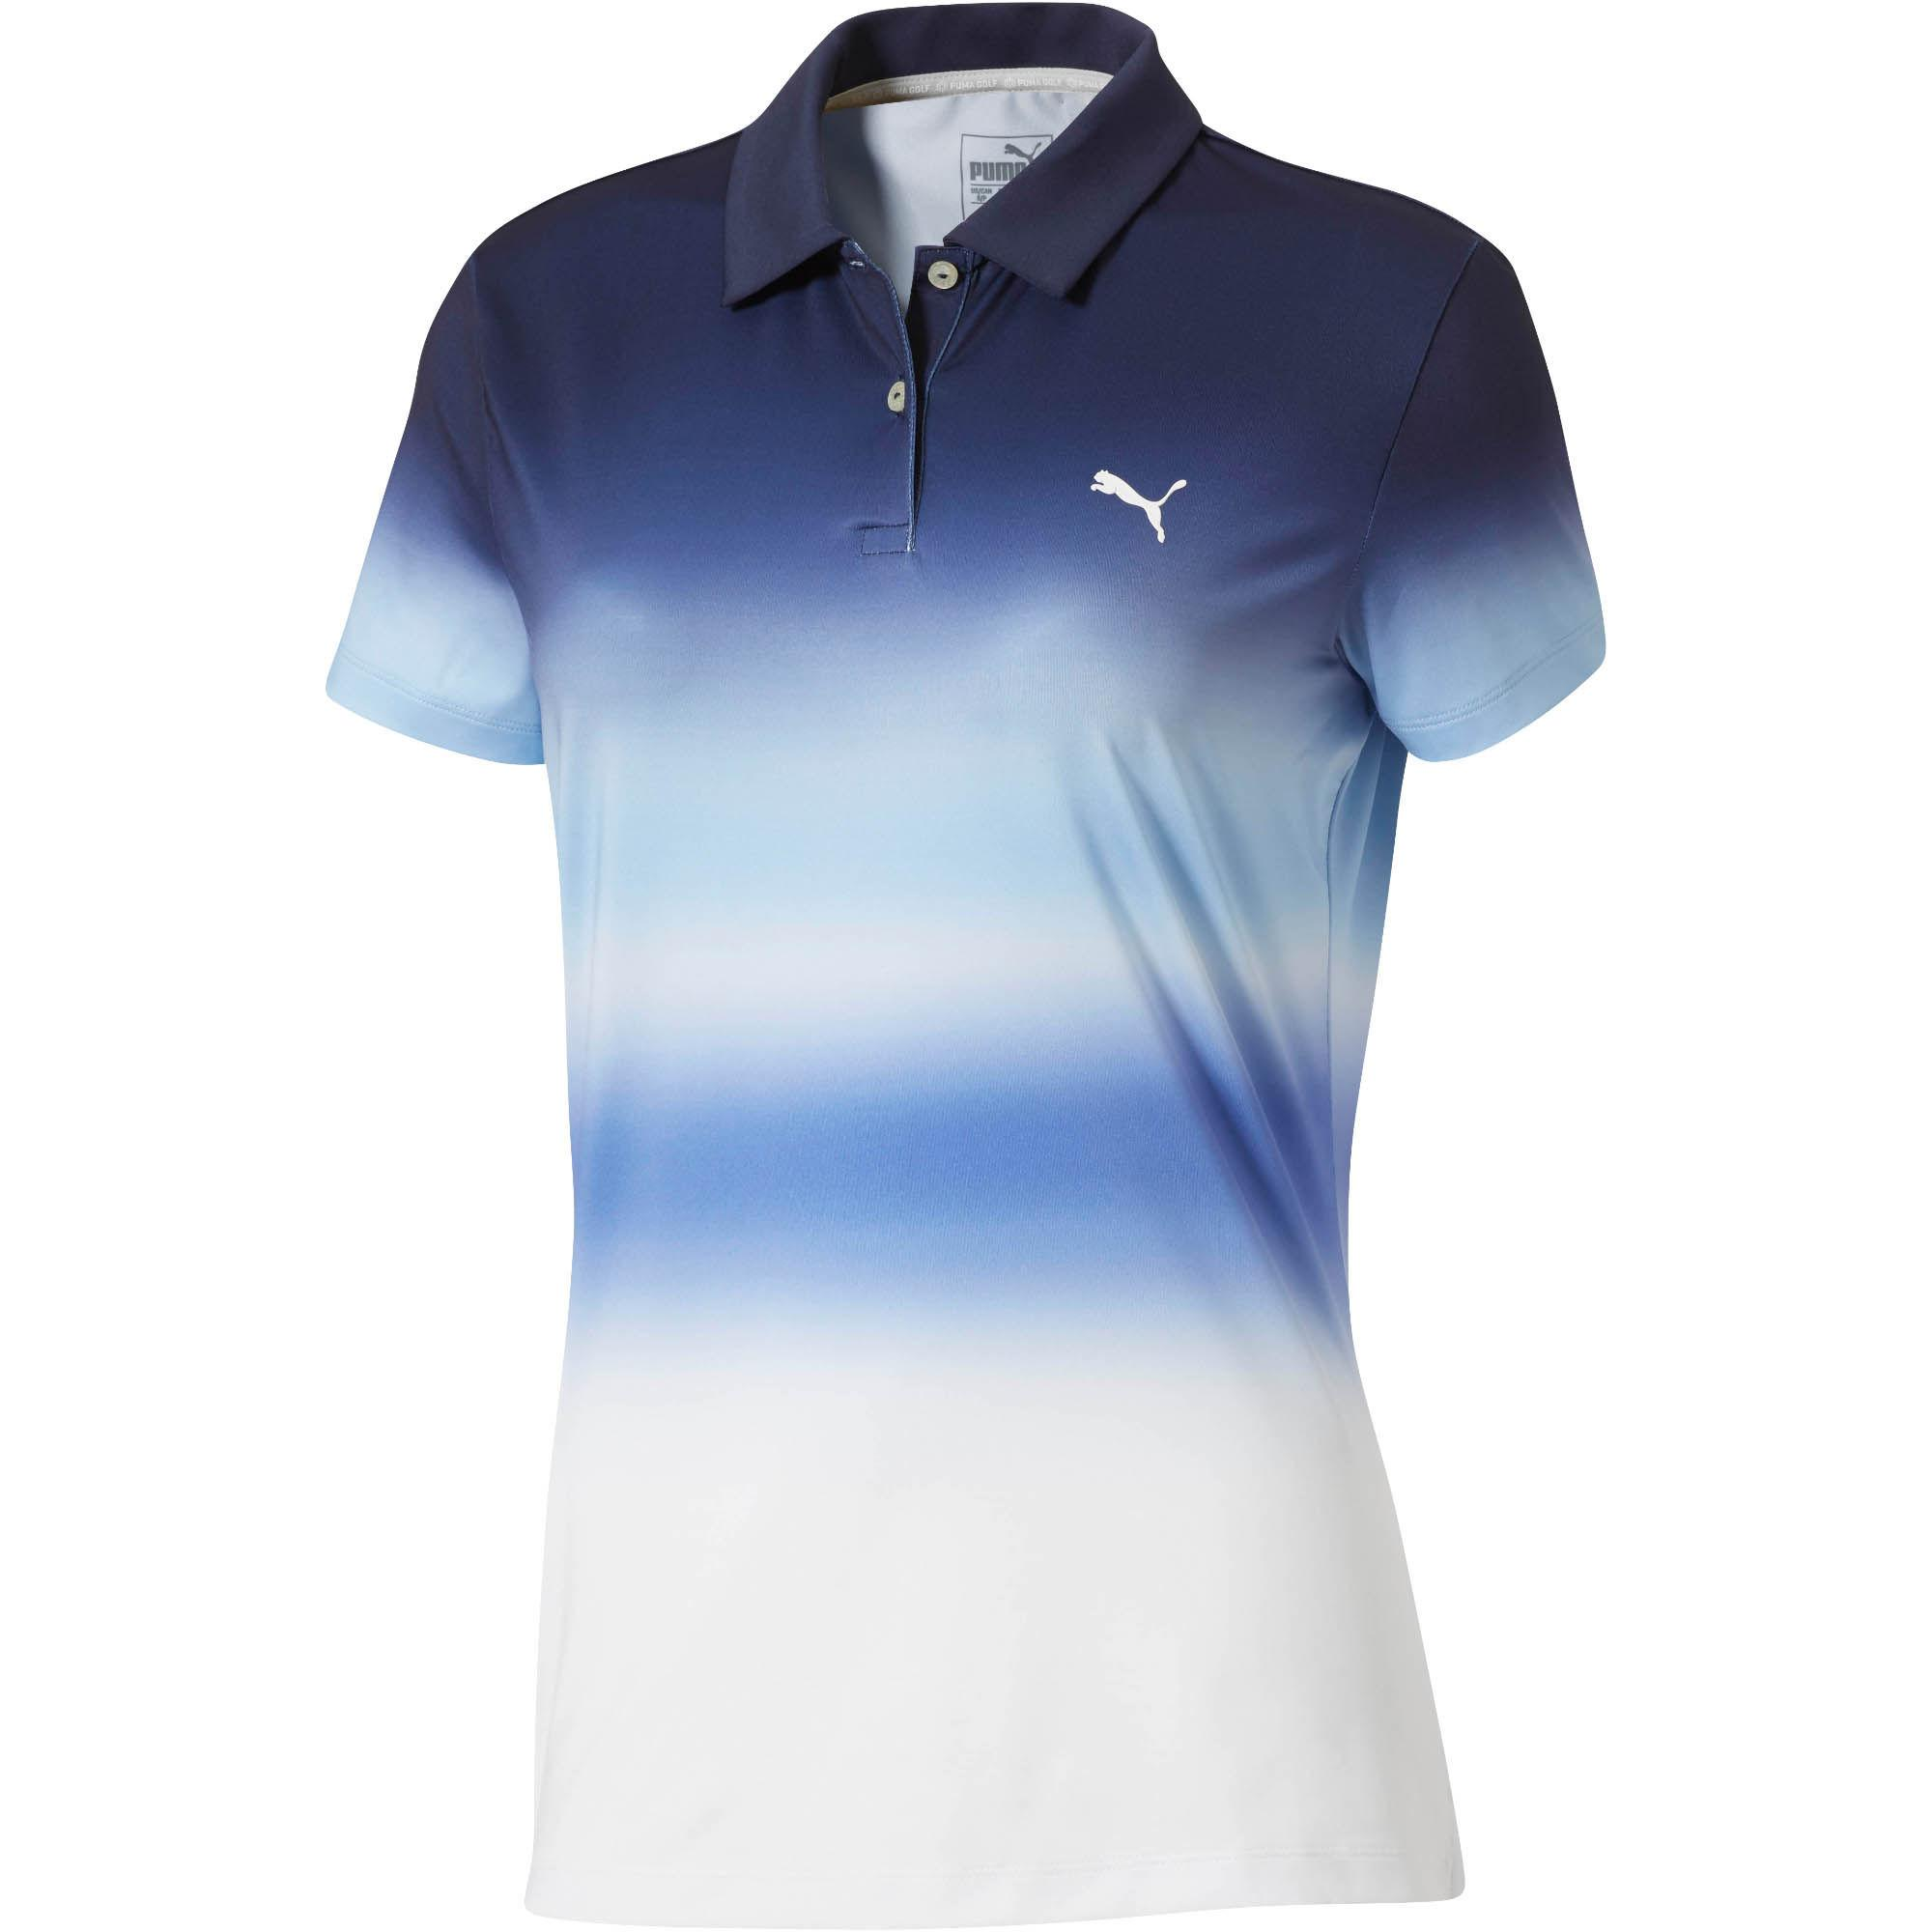 f8e0da4f3055 Lyst - PUMA Tie Dye Golf Polo Shirt in Blue